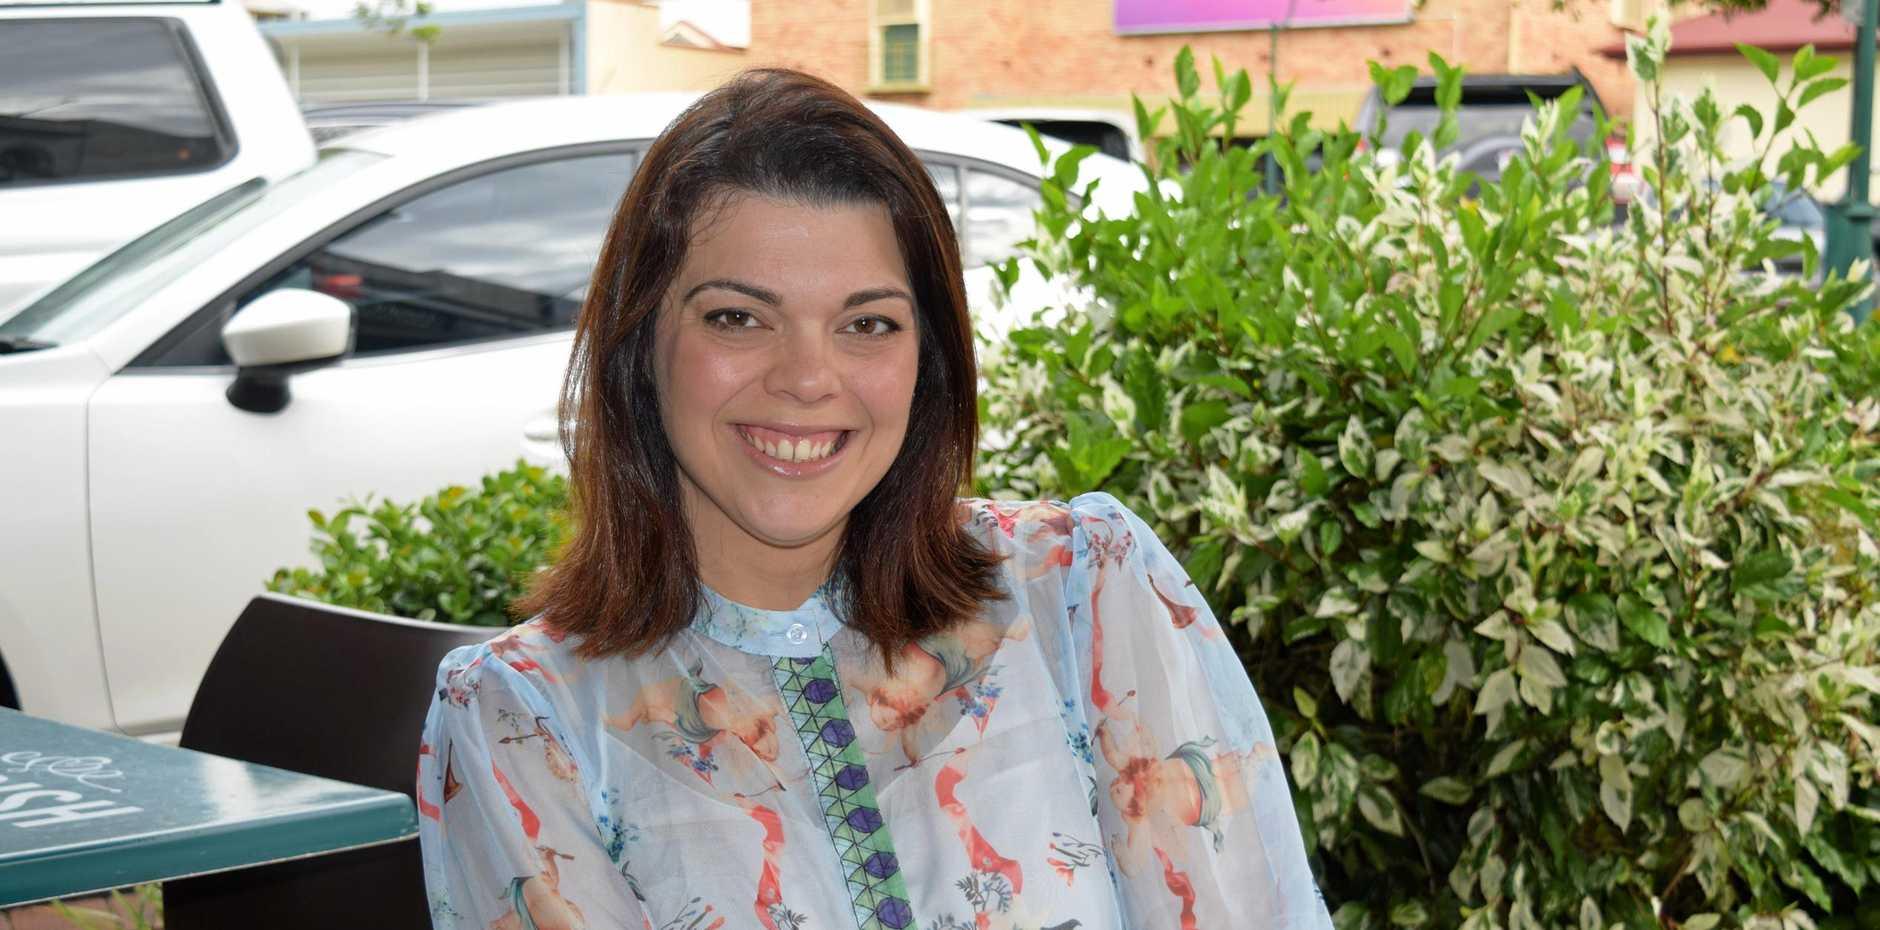 BUNDABERG PROUD: Sparrowly Group founder Giovanna Lever is a Bundy woman through and through.